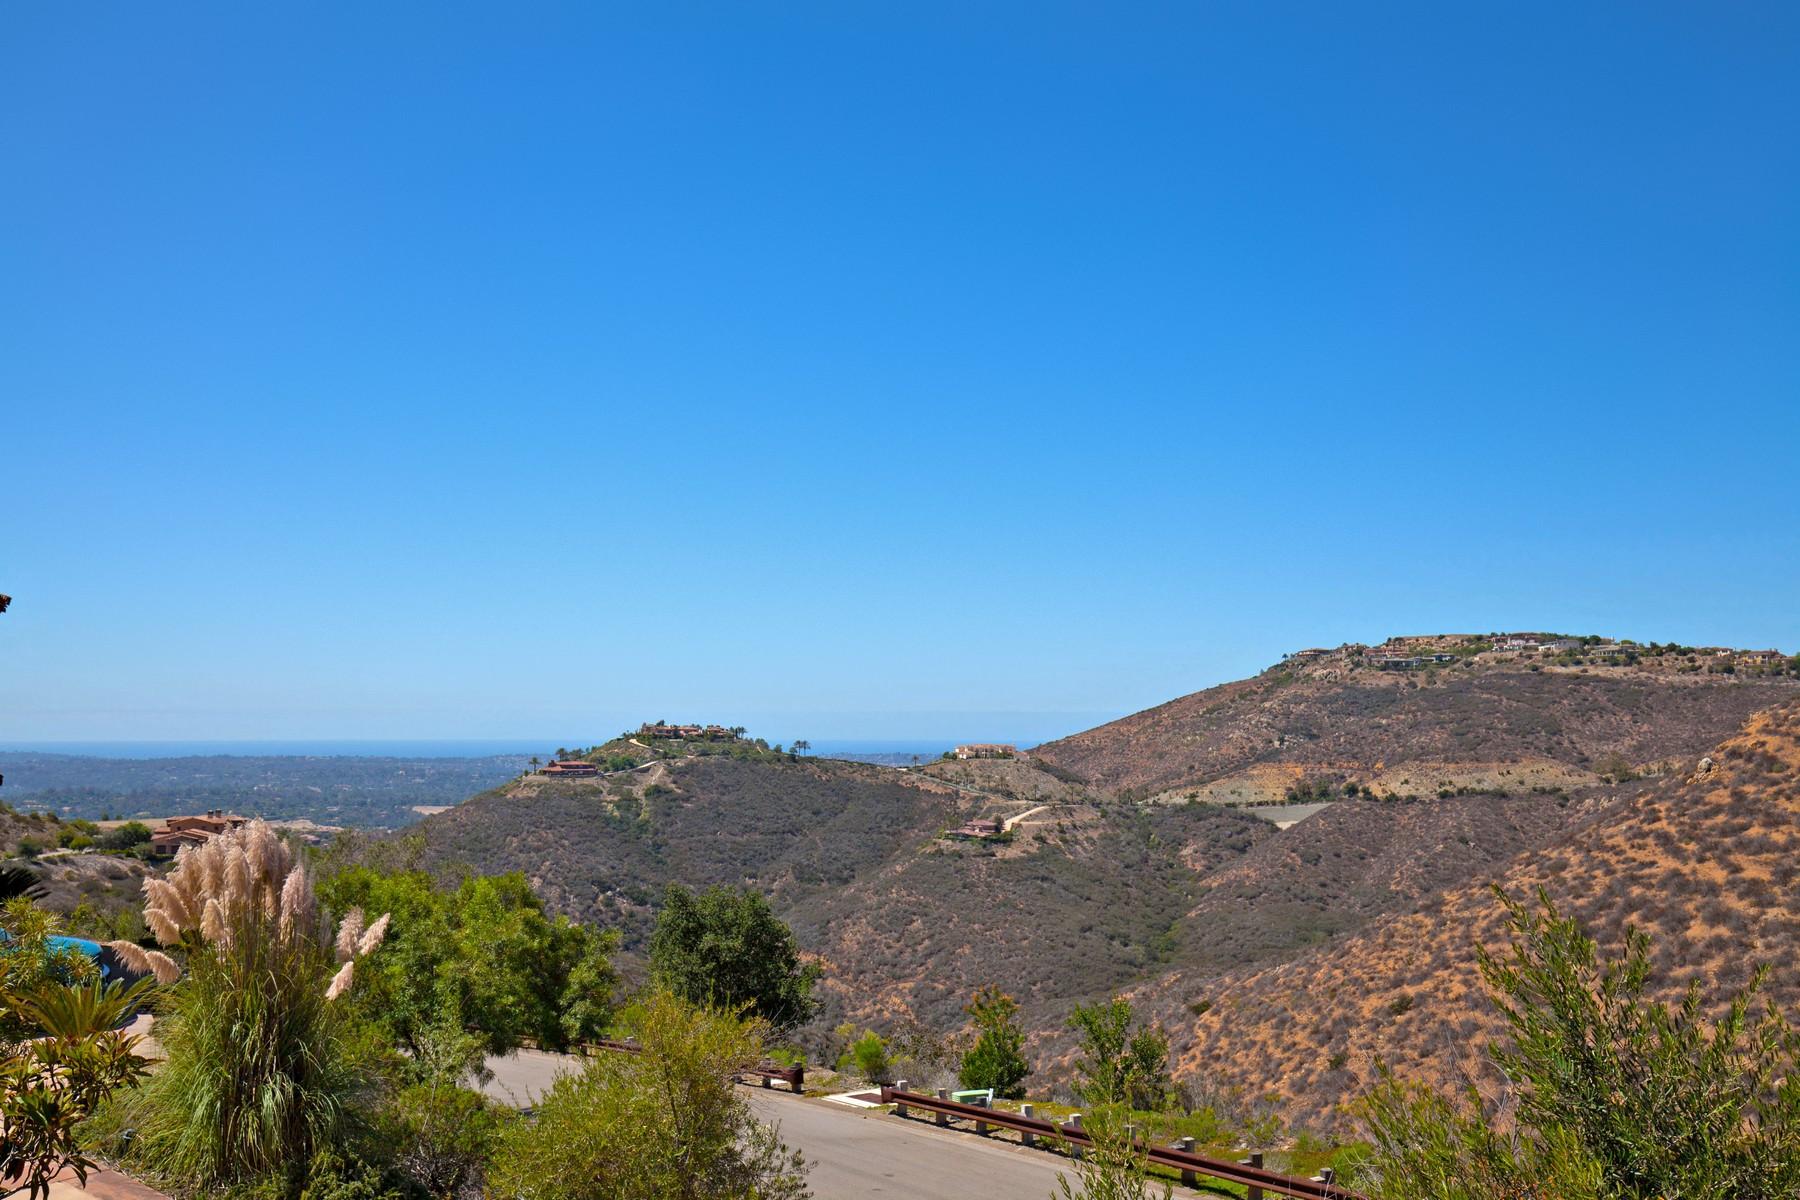 Land for Sale at El Brazo lot 87 Rancho Santa Fe, California 92067 United States